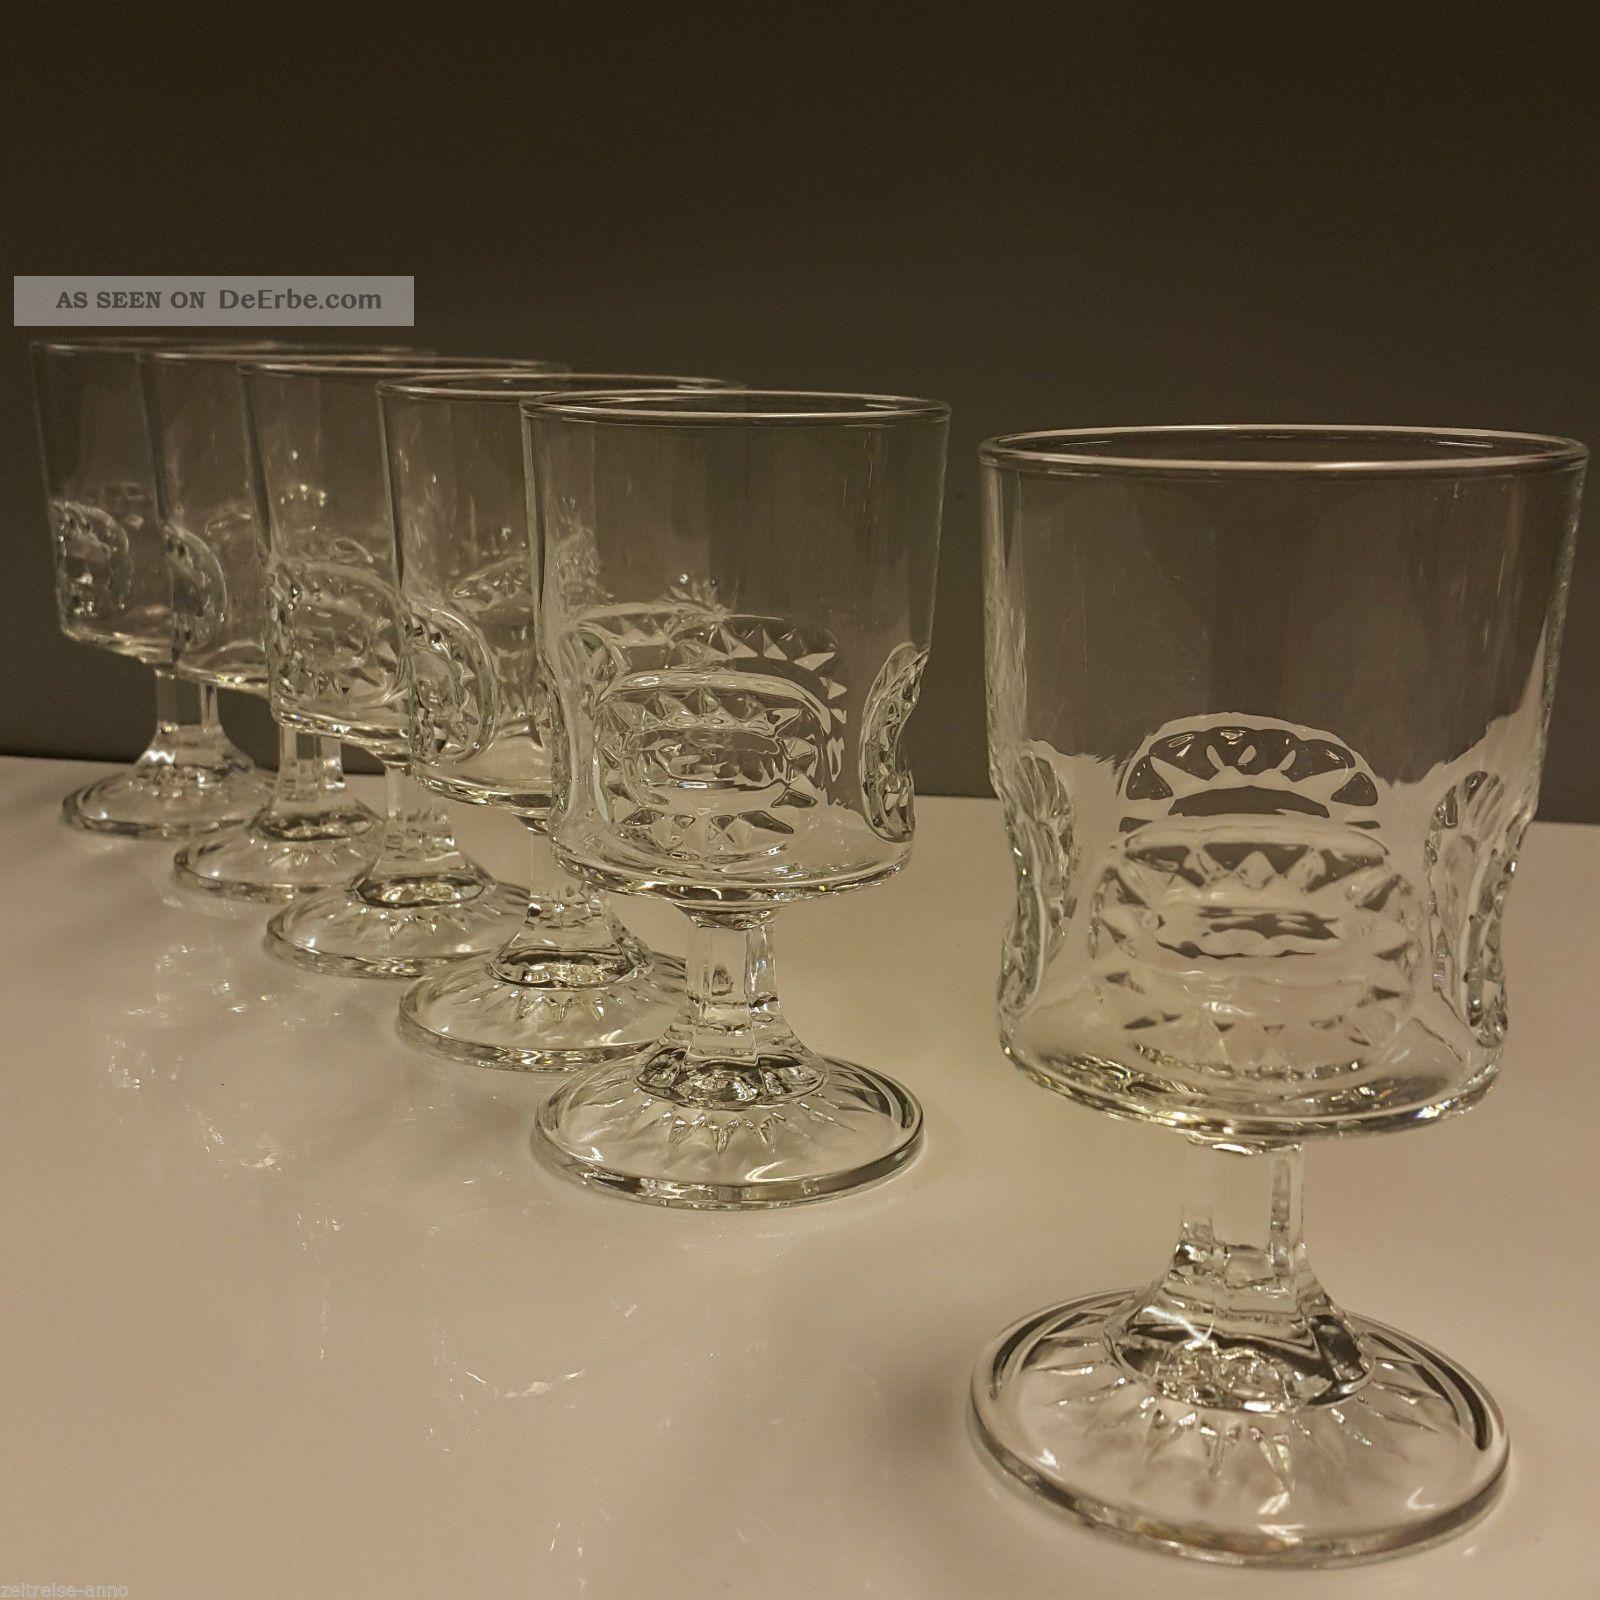 6 Weingläser Aperitifgläser Made In France Seltenes Vintage Design 11,  5cm H Kristall Bild